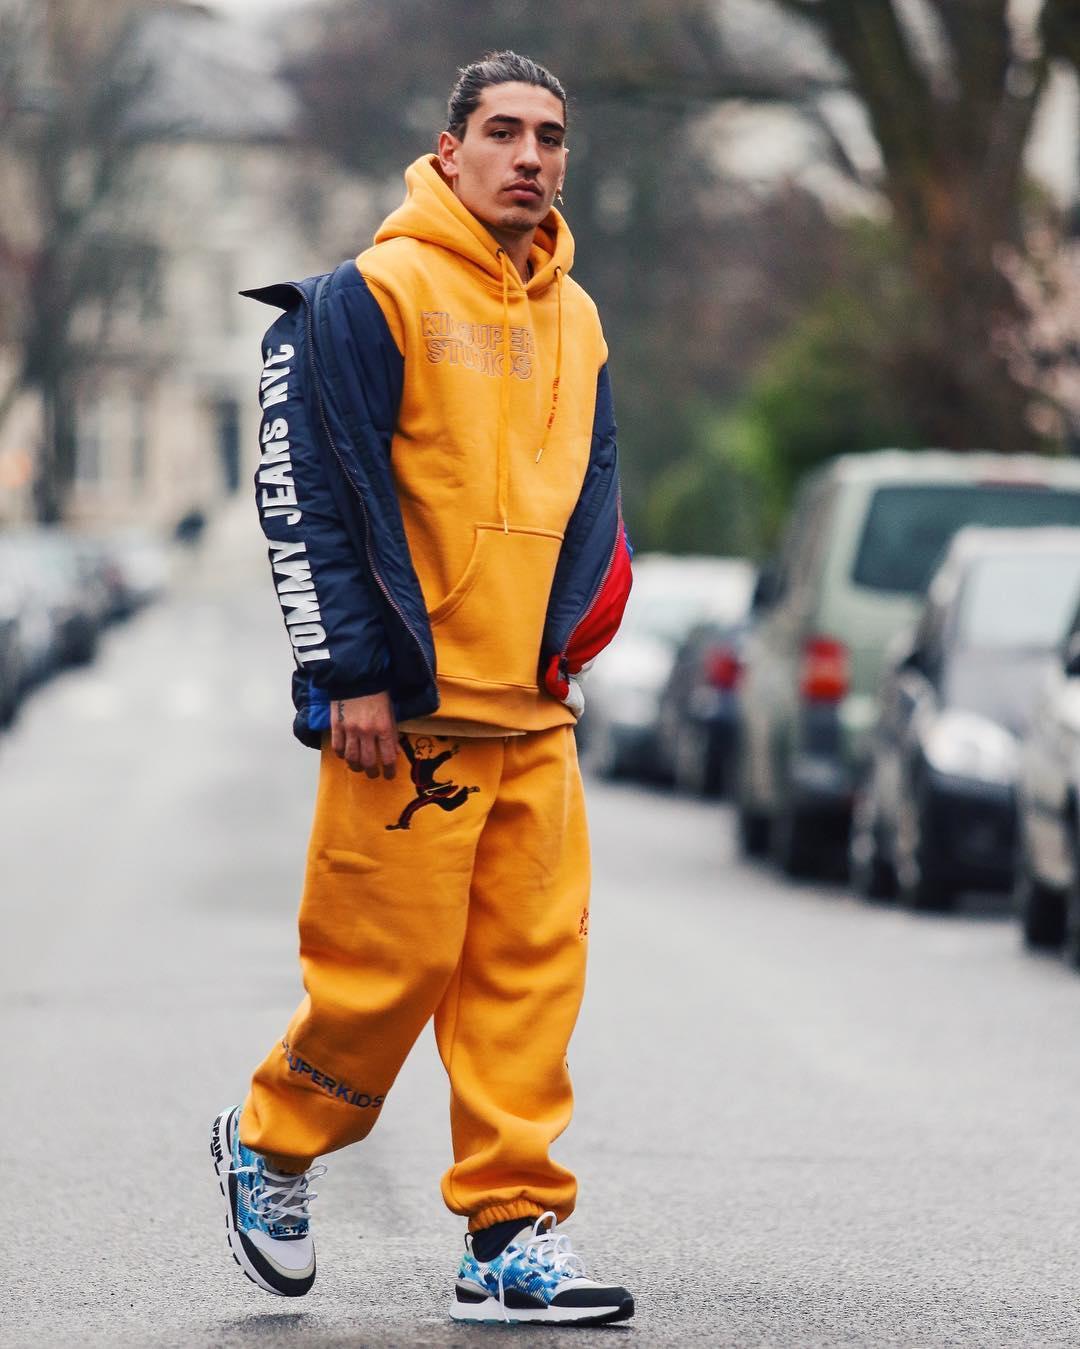 SPOTTED: Héctor Bellerín in KidSuper Tracksuit and Tommy Jeans Jacket